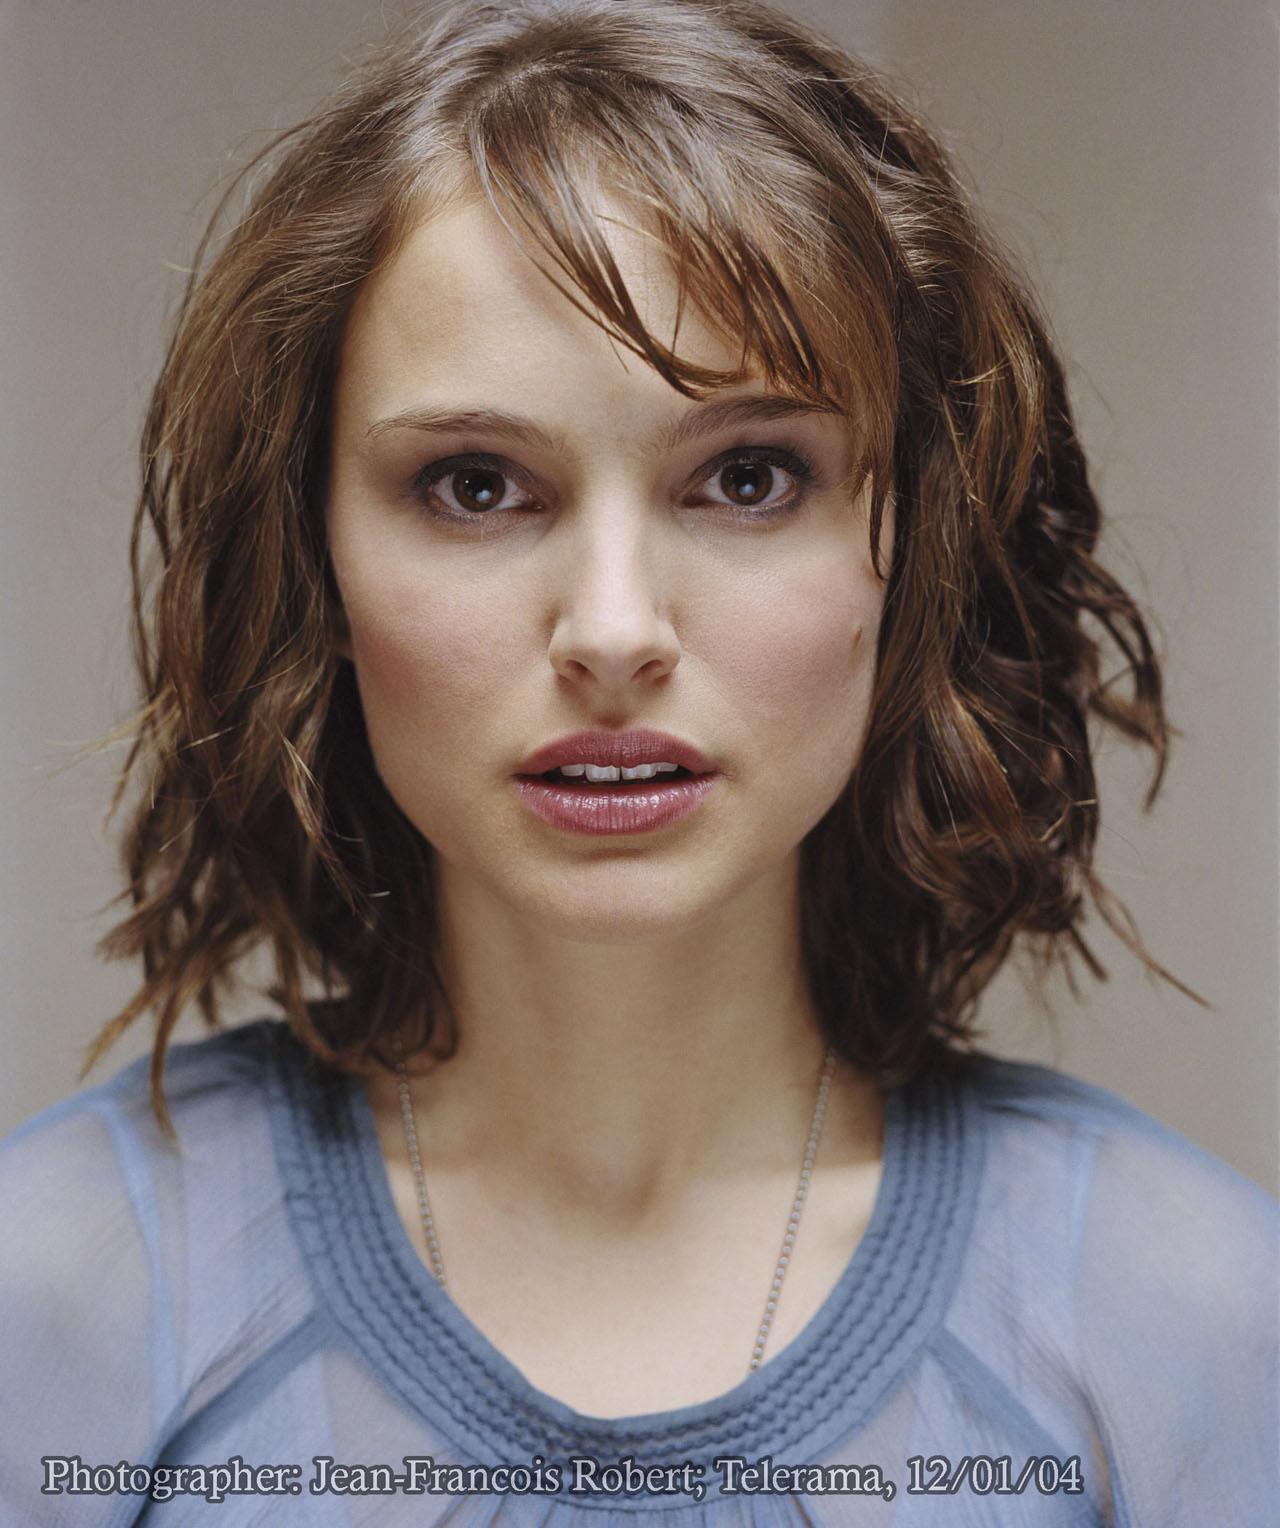 BartCop's Movie Hotties - Natalie Portman - Page 50 Natalie Portman Wikipedia